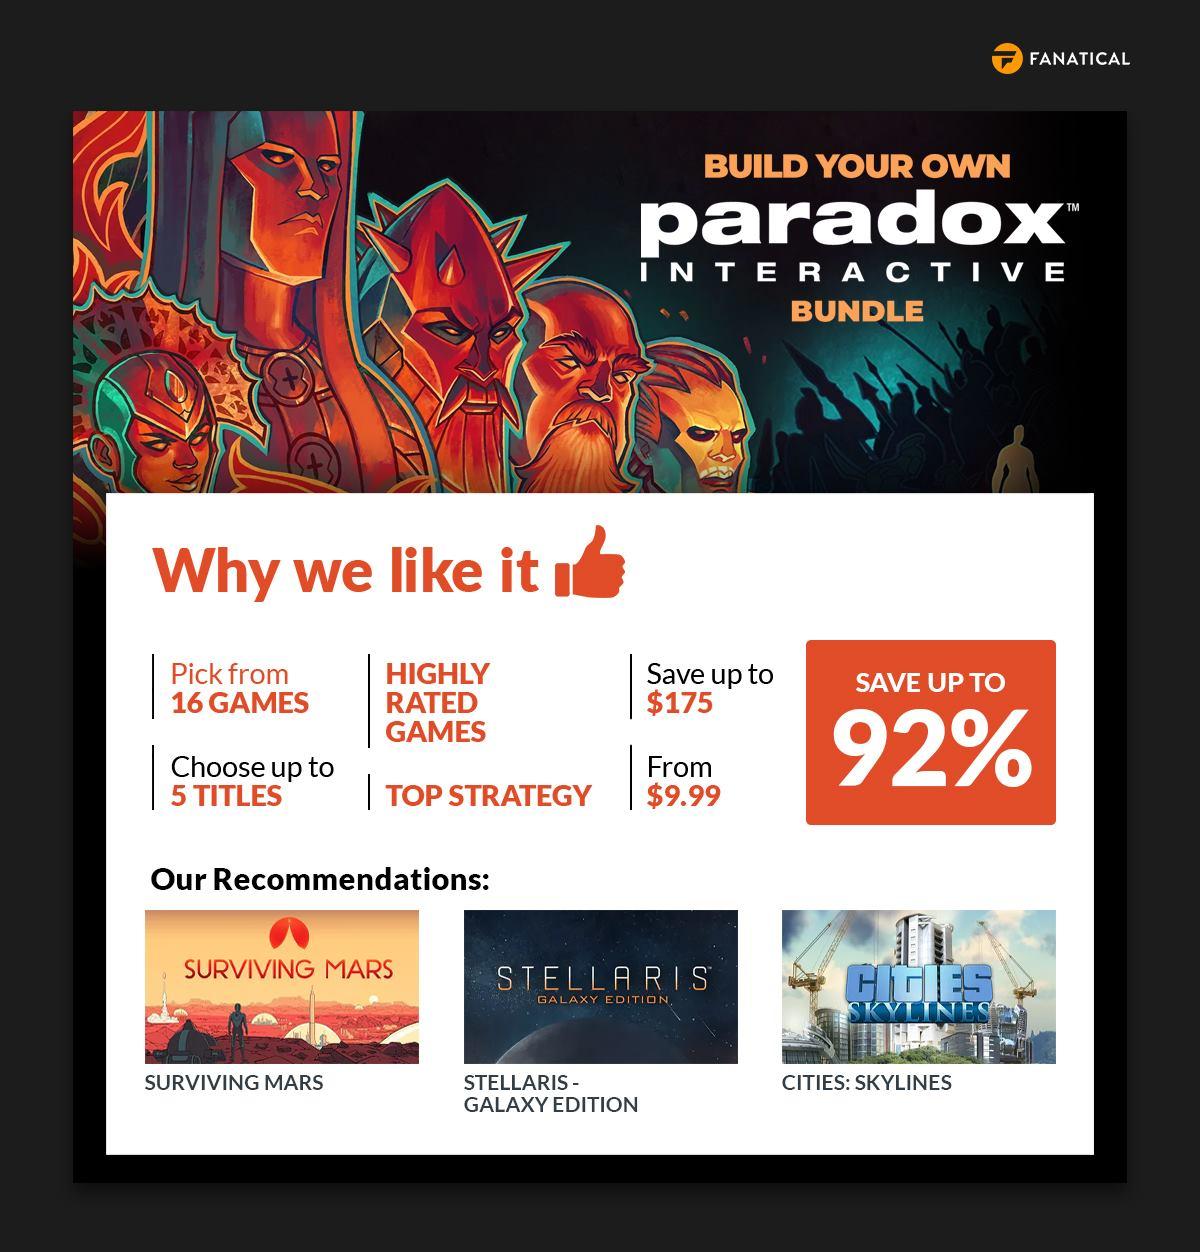 Fanatical Build Your Own Paradox Interactive Bundle